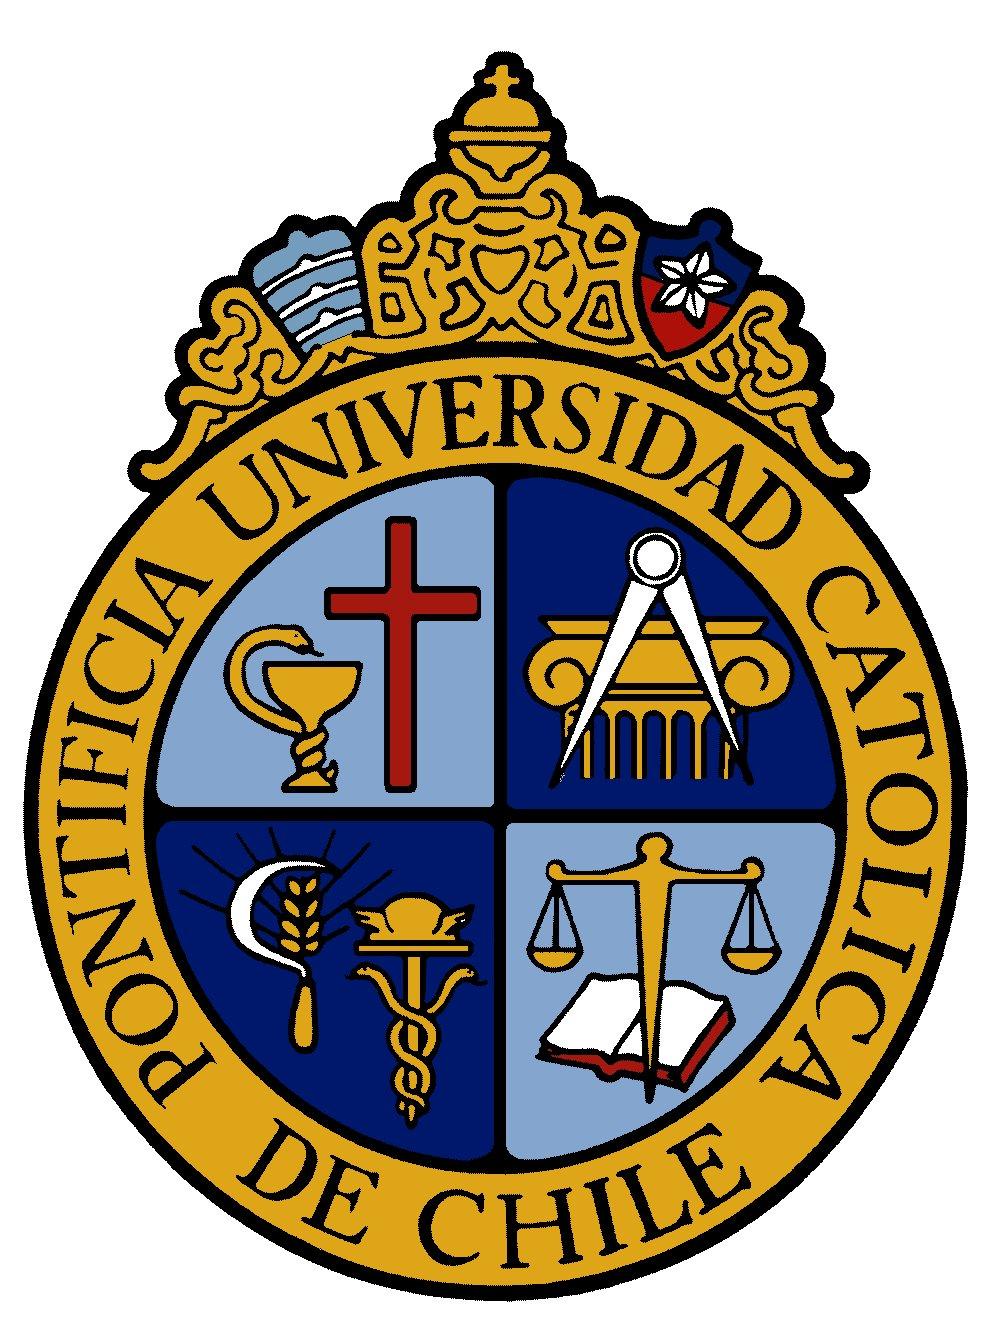 U Catolica De Chile Universidad Pontificia...